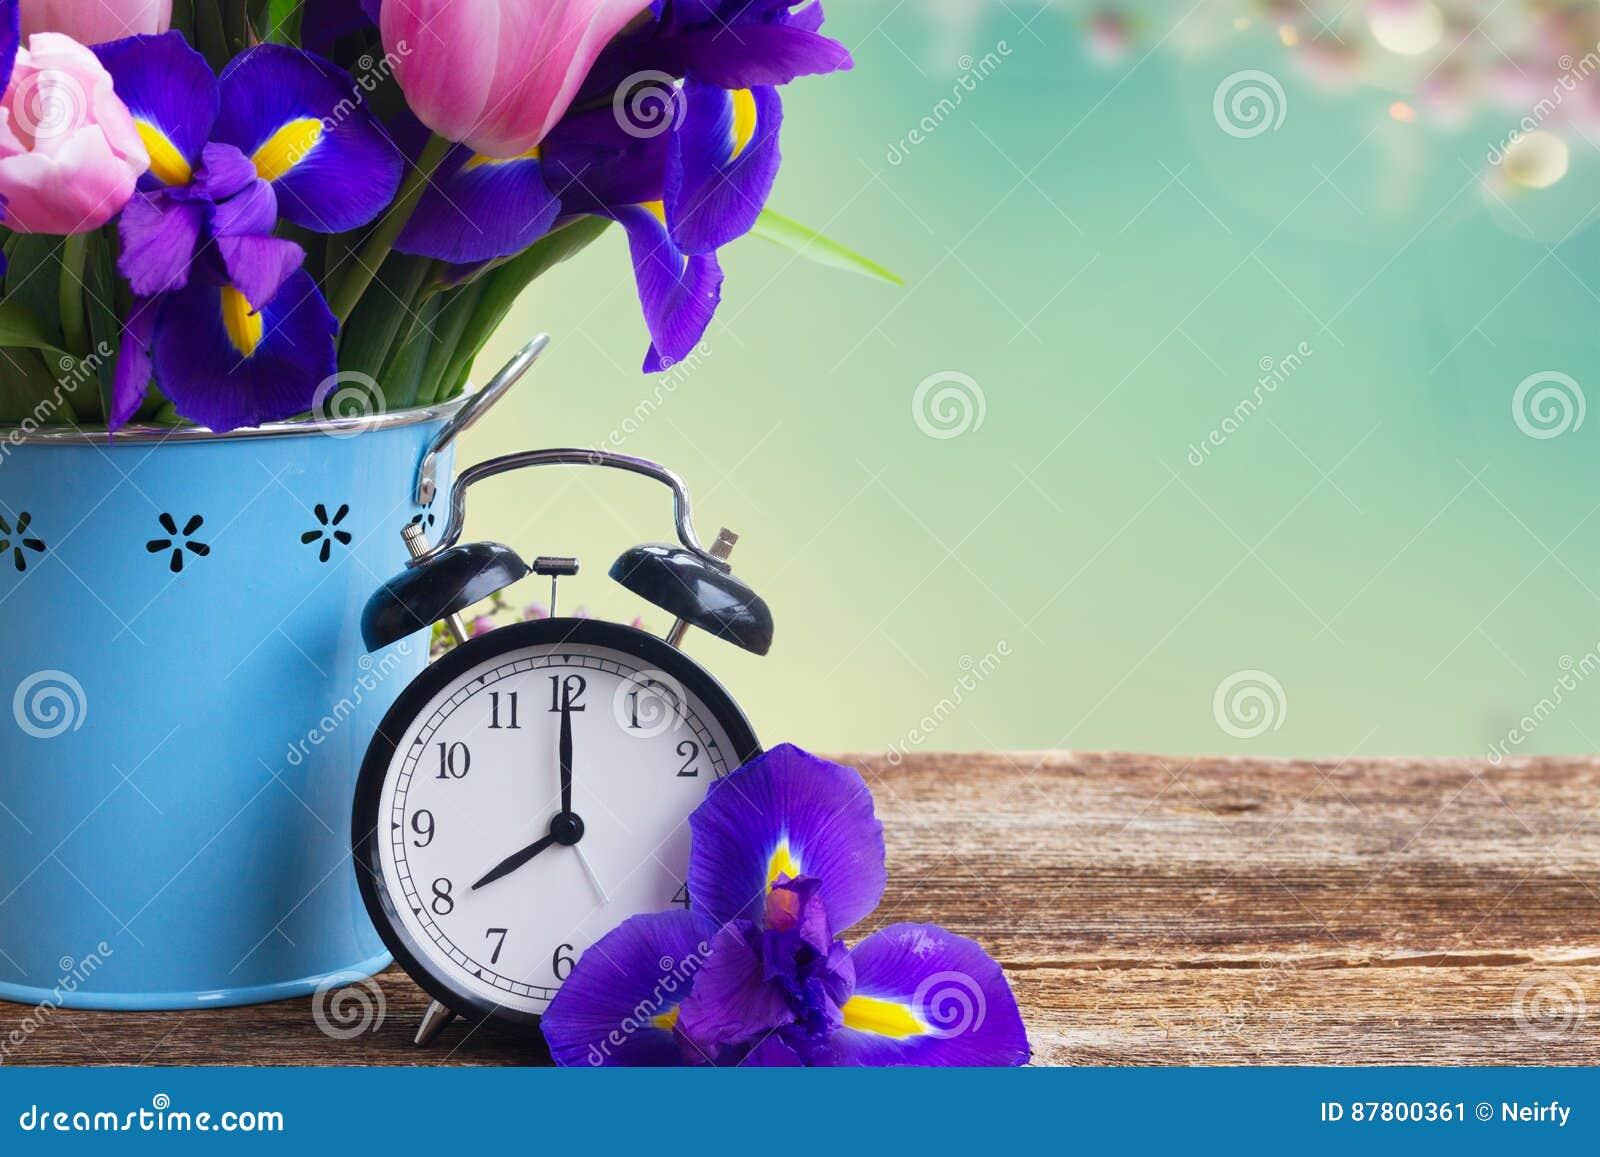 Spring time concept